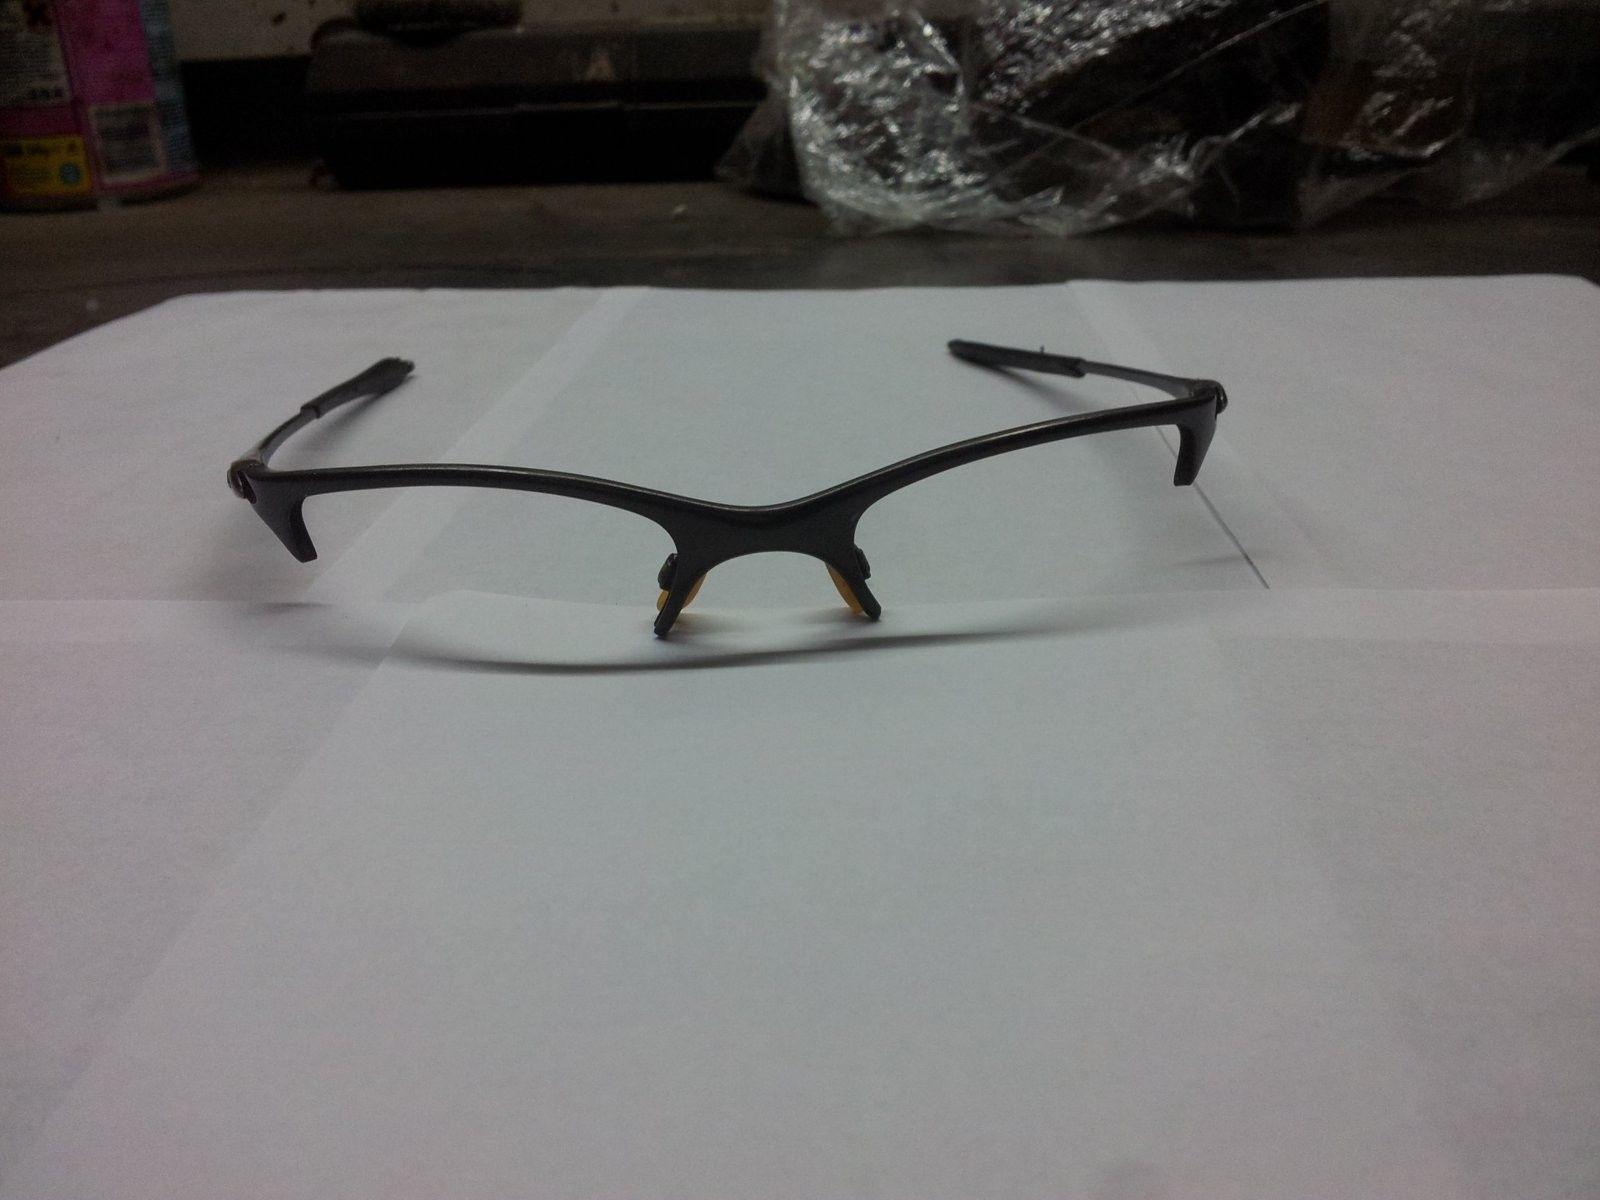 Identifying A Frame For A Newbe.... - 20140704_212808.jpg